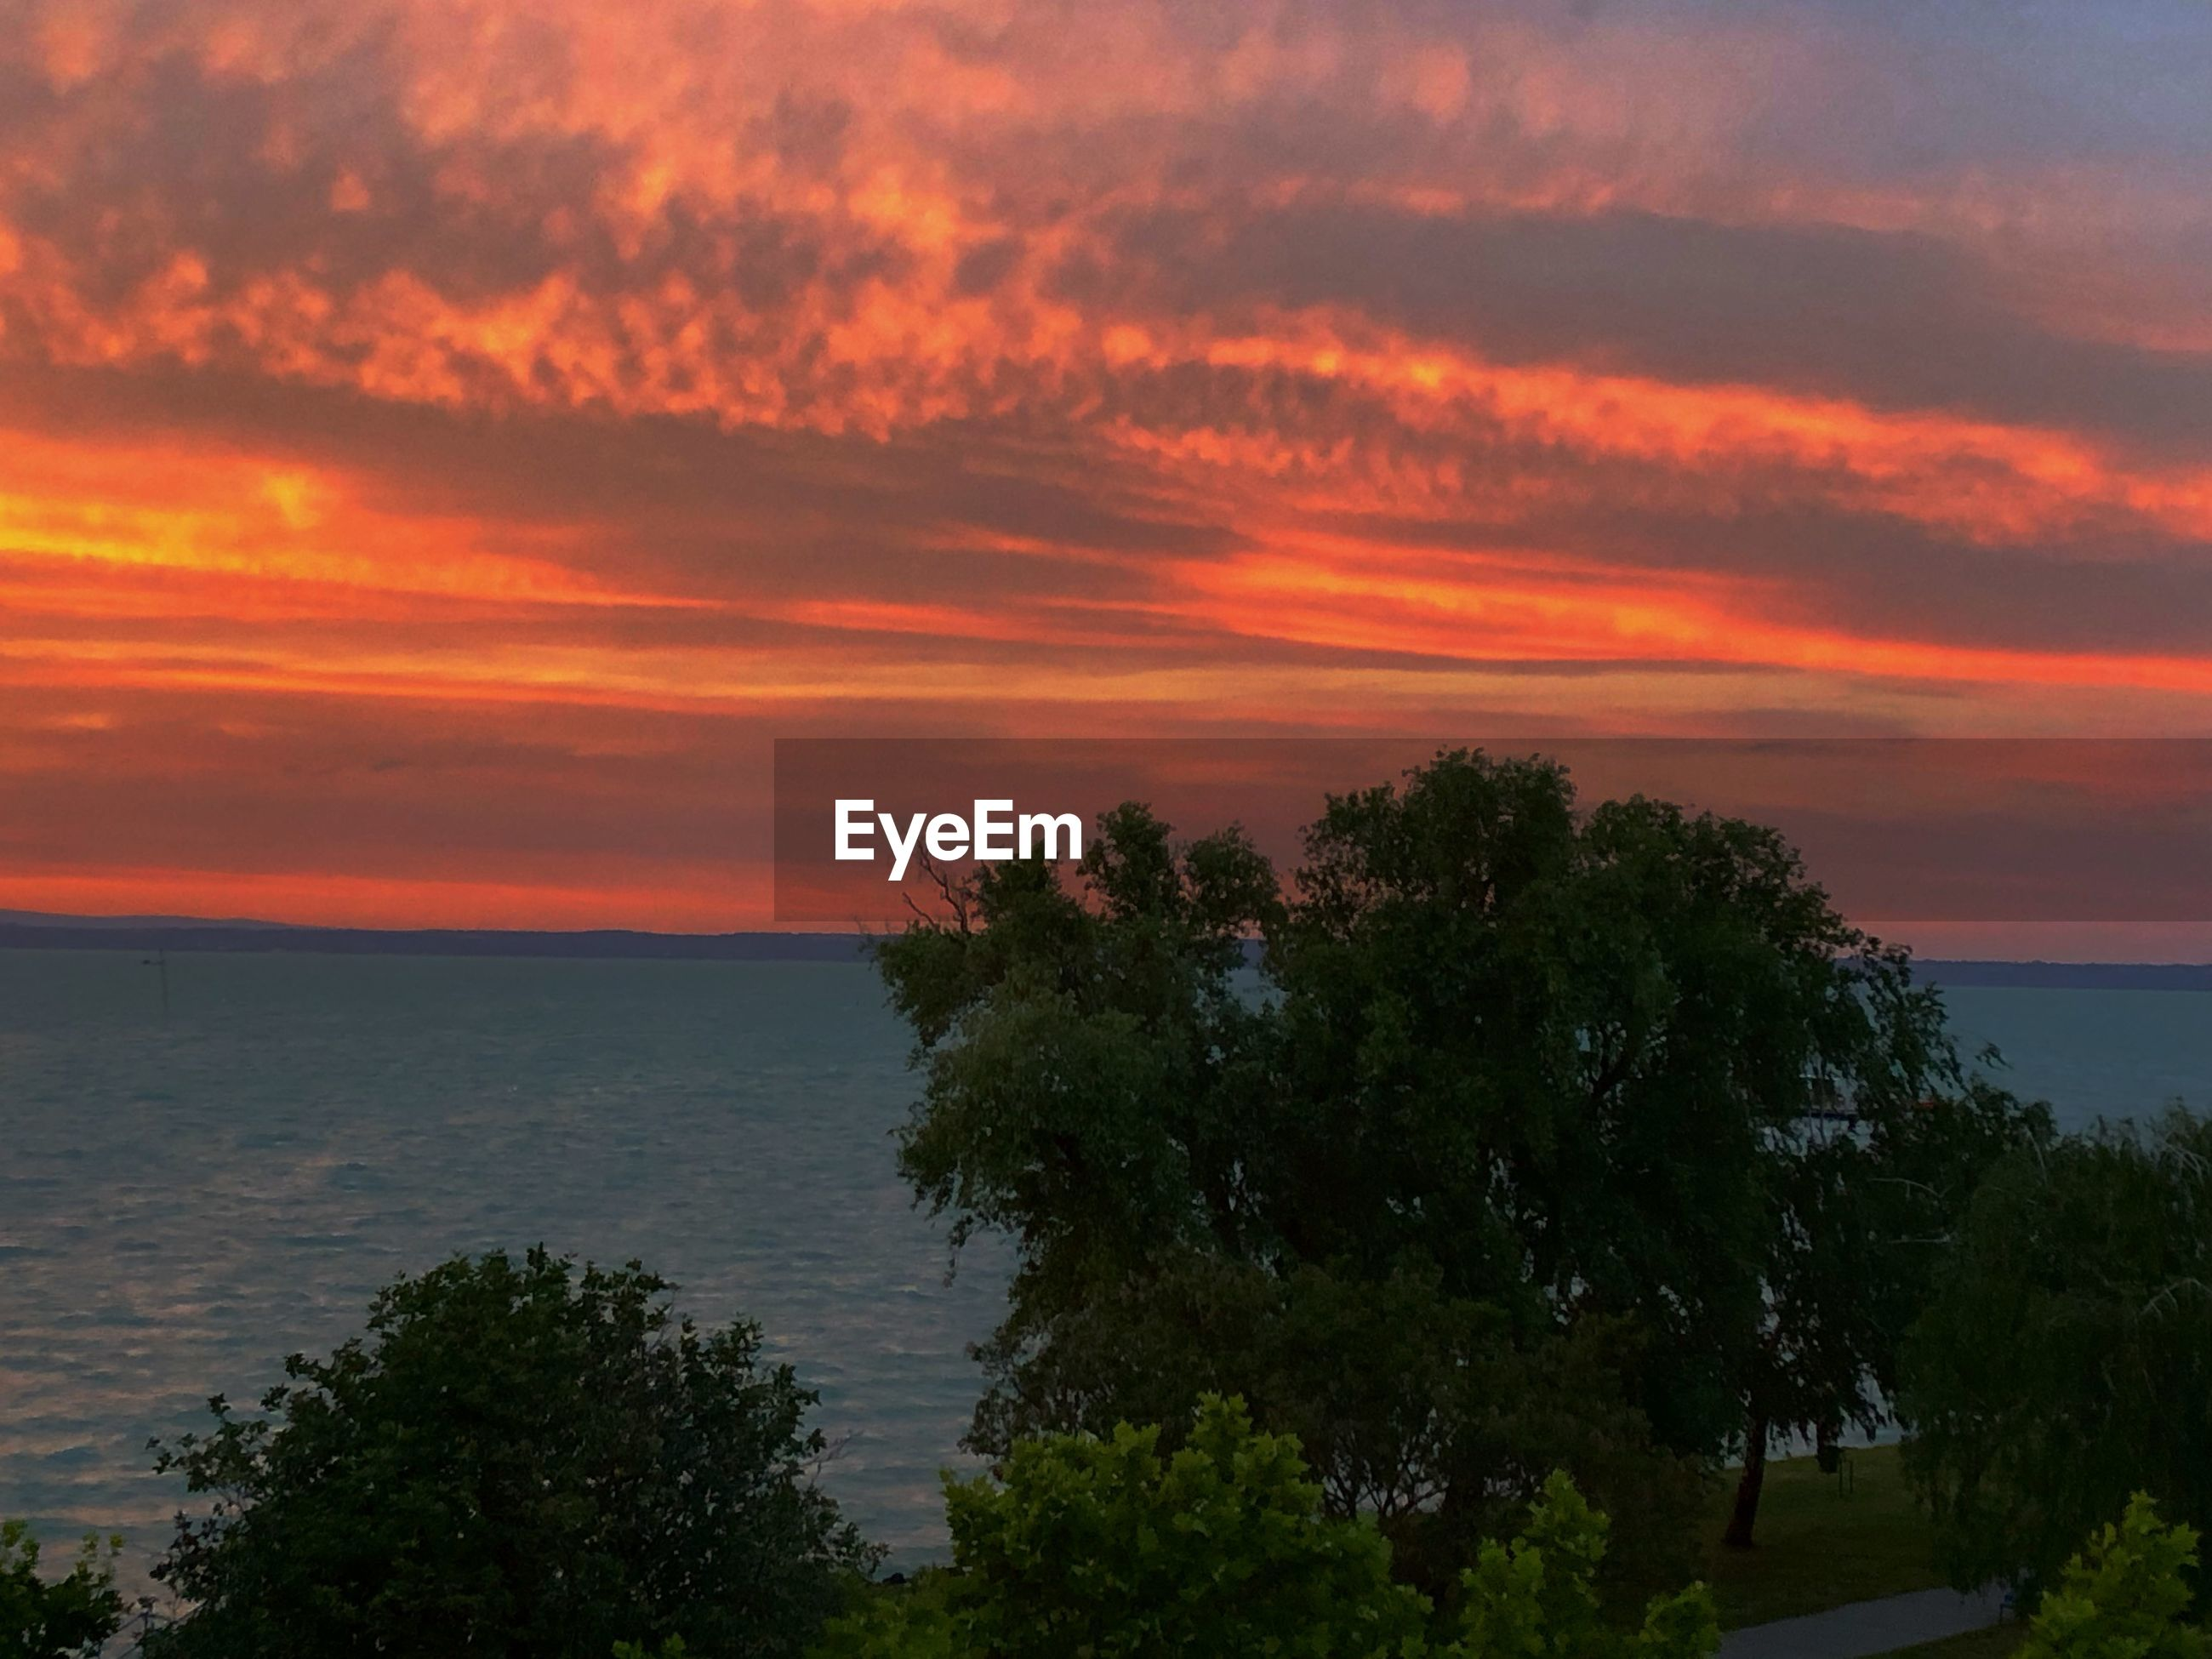 SCENIC VIEW OF SEA AGAINST ORANGE SUNSET SKY